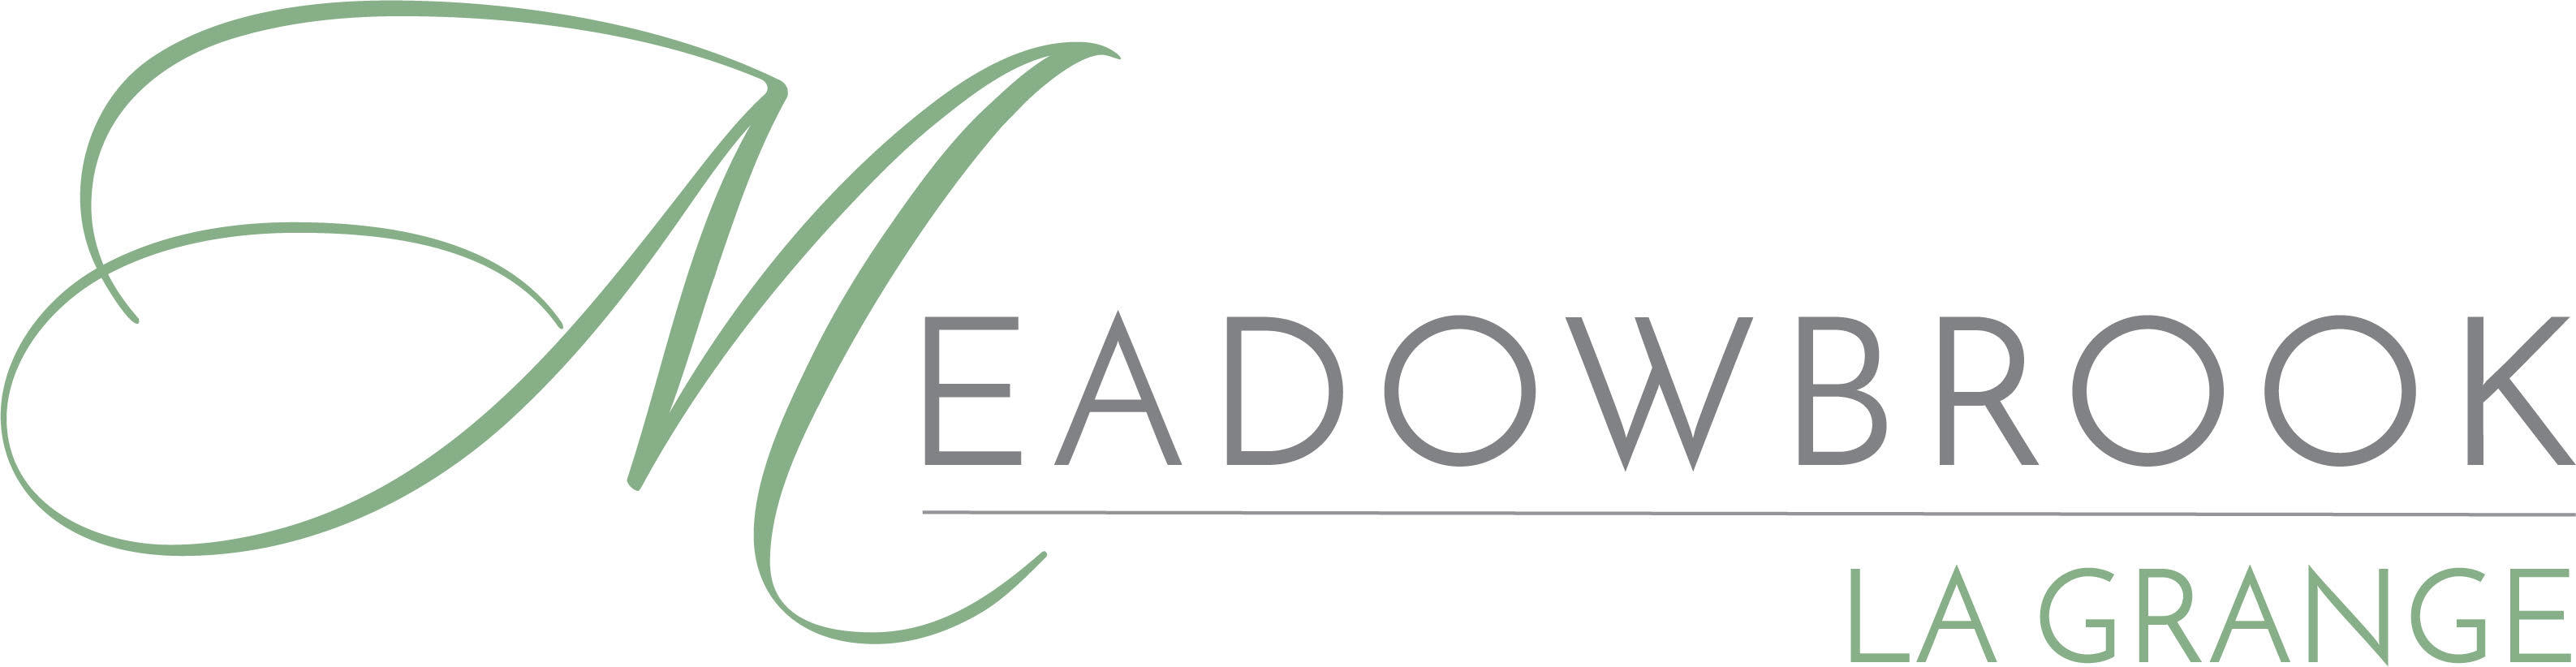 Meadowbrook manor